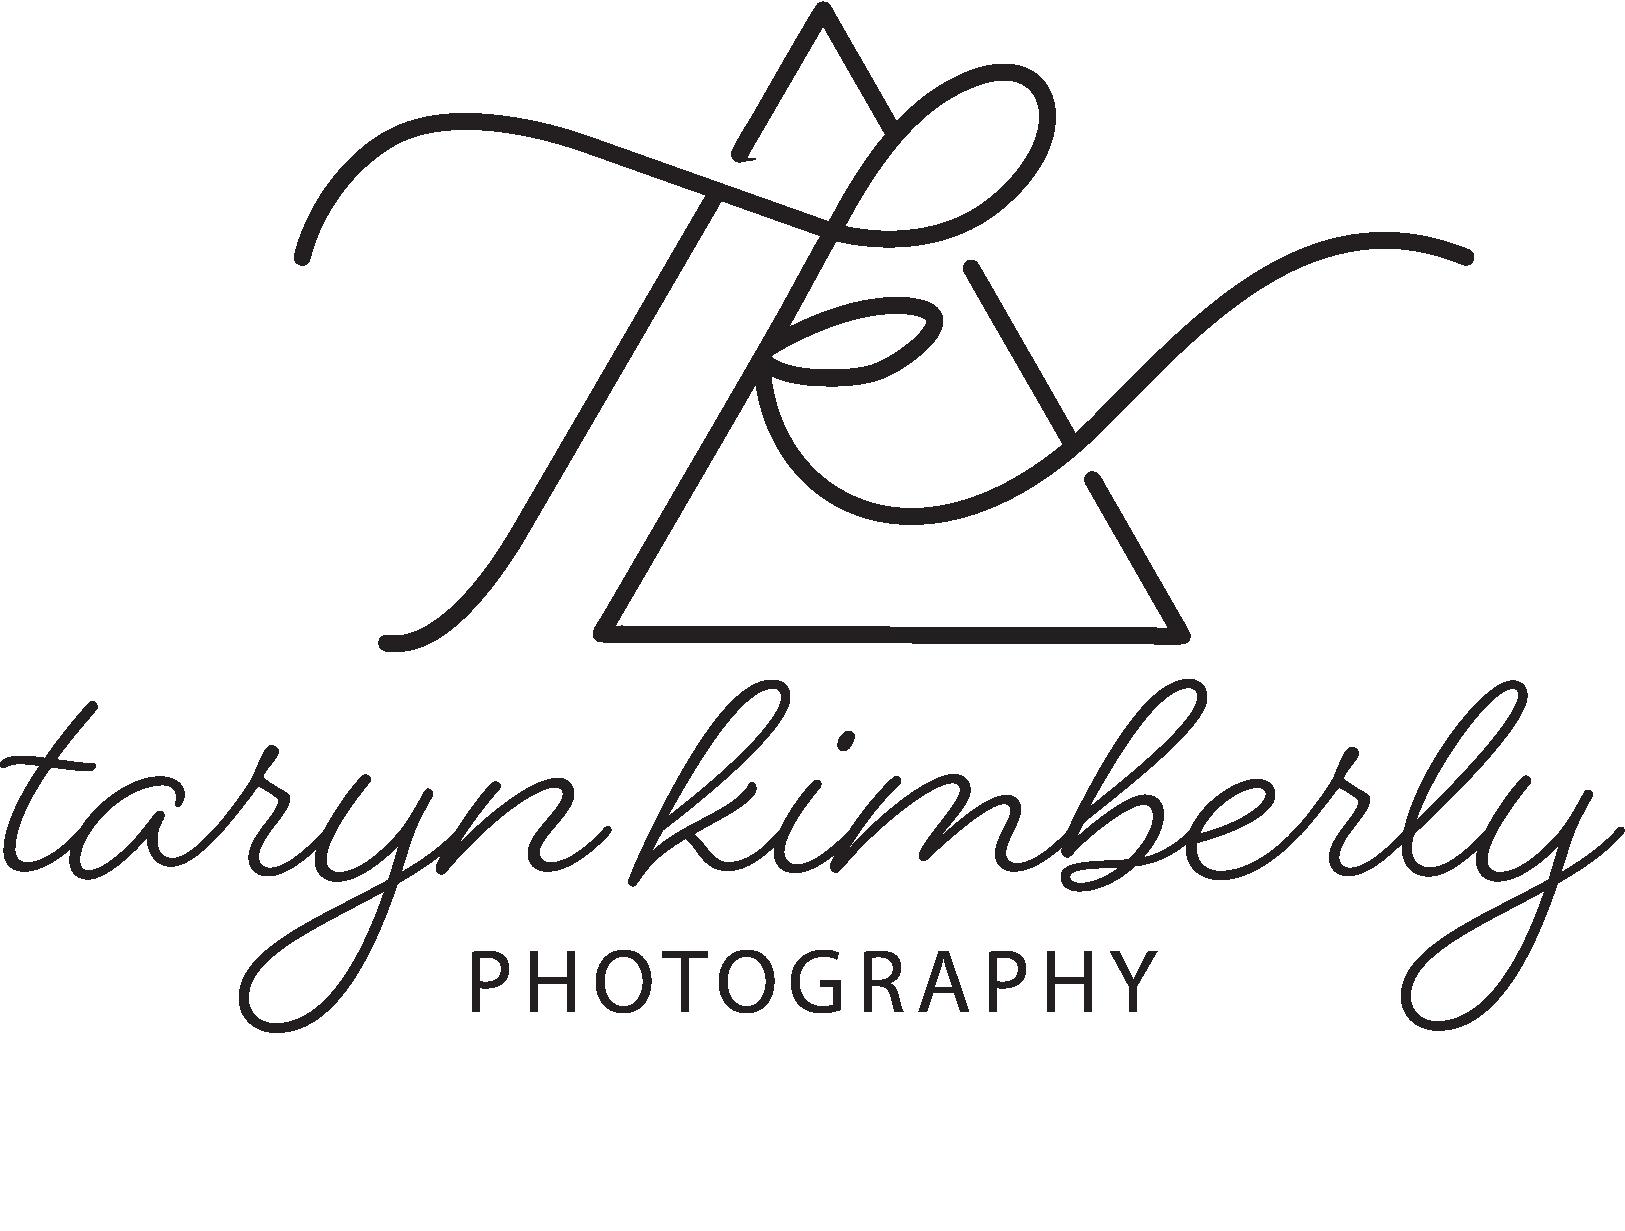 taryn kimberly photography logo in black